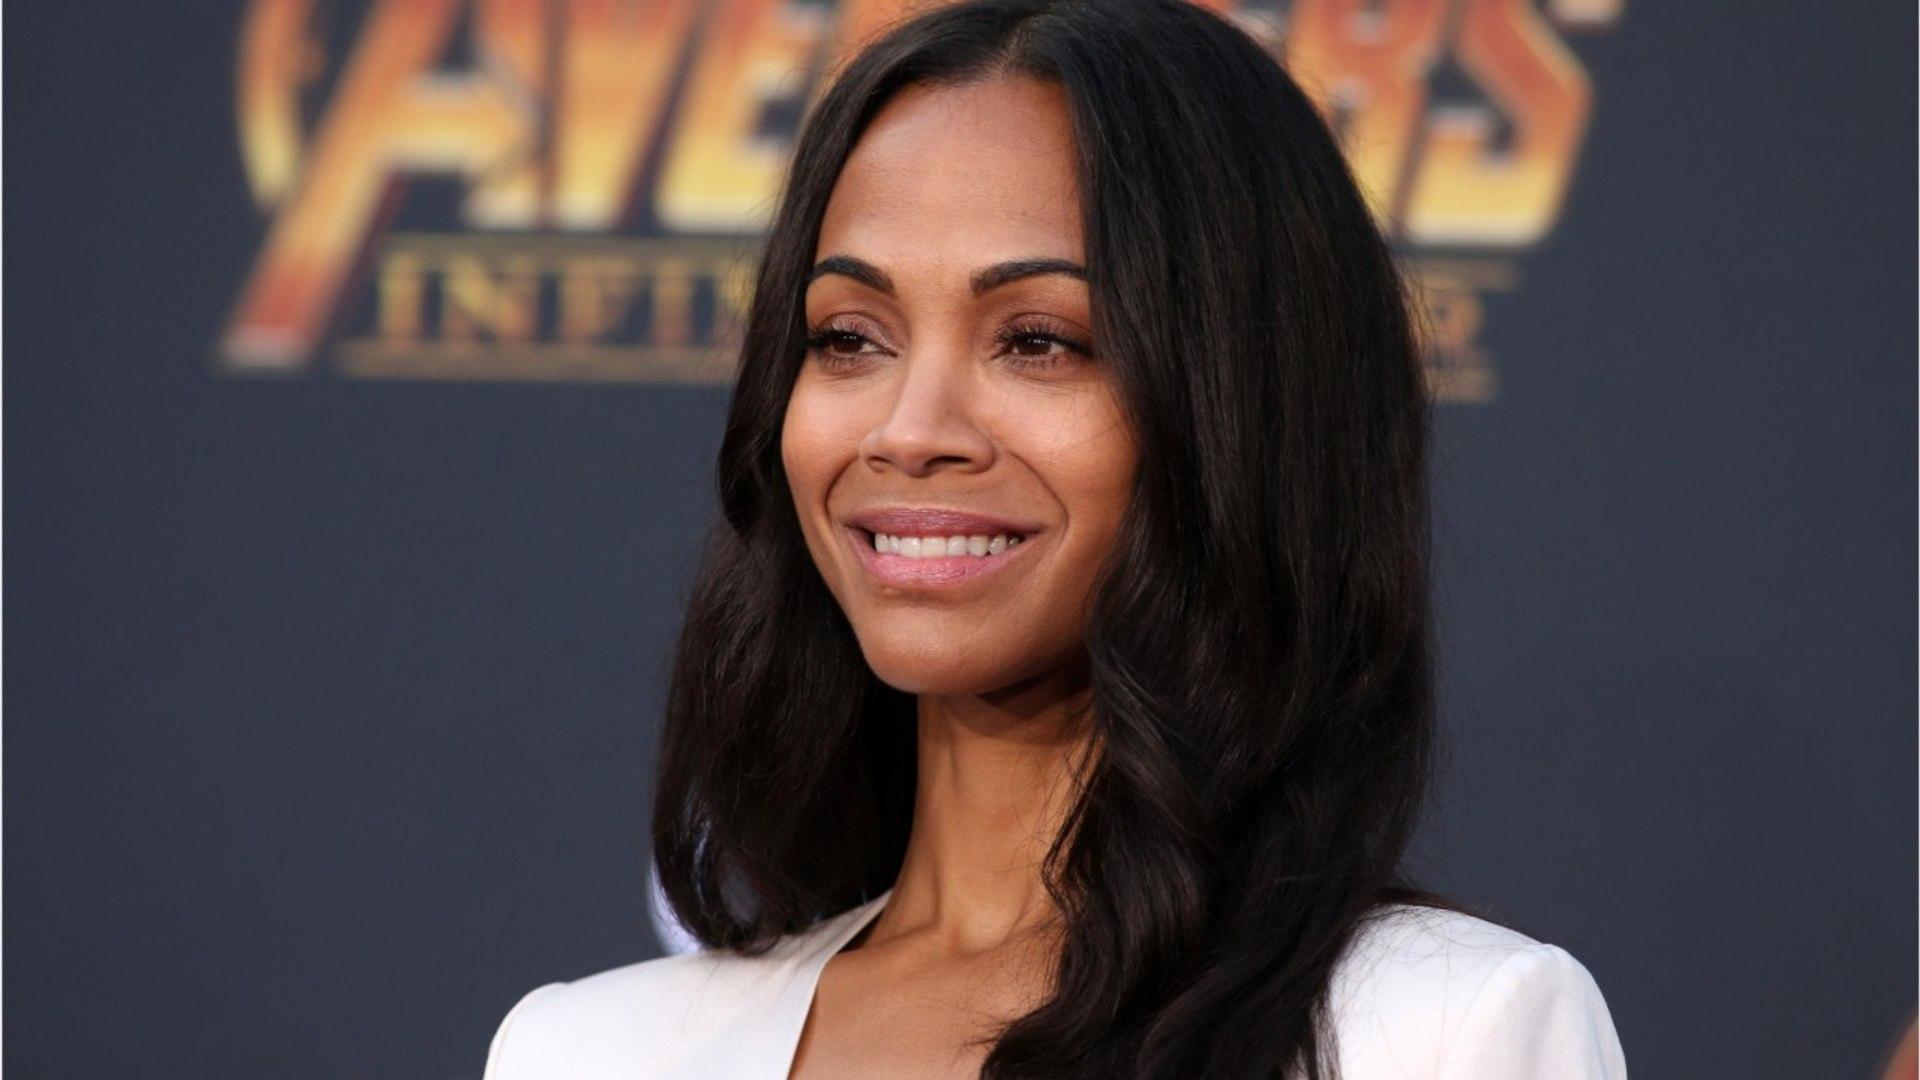 Zoe Saldana's Social Media Stirs 'Avengers: Infinity War' Rumors